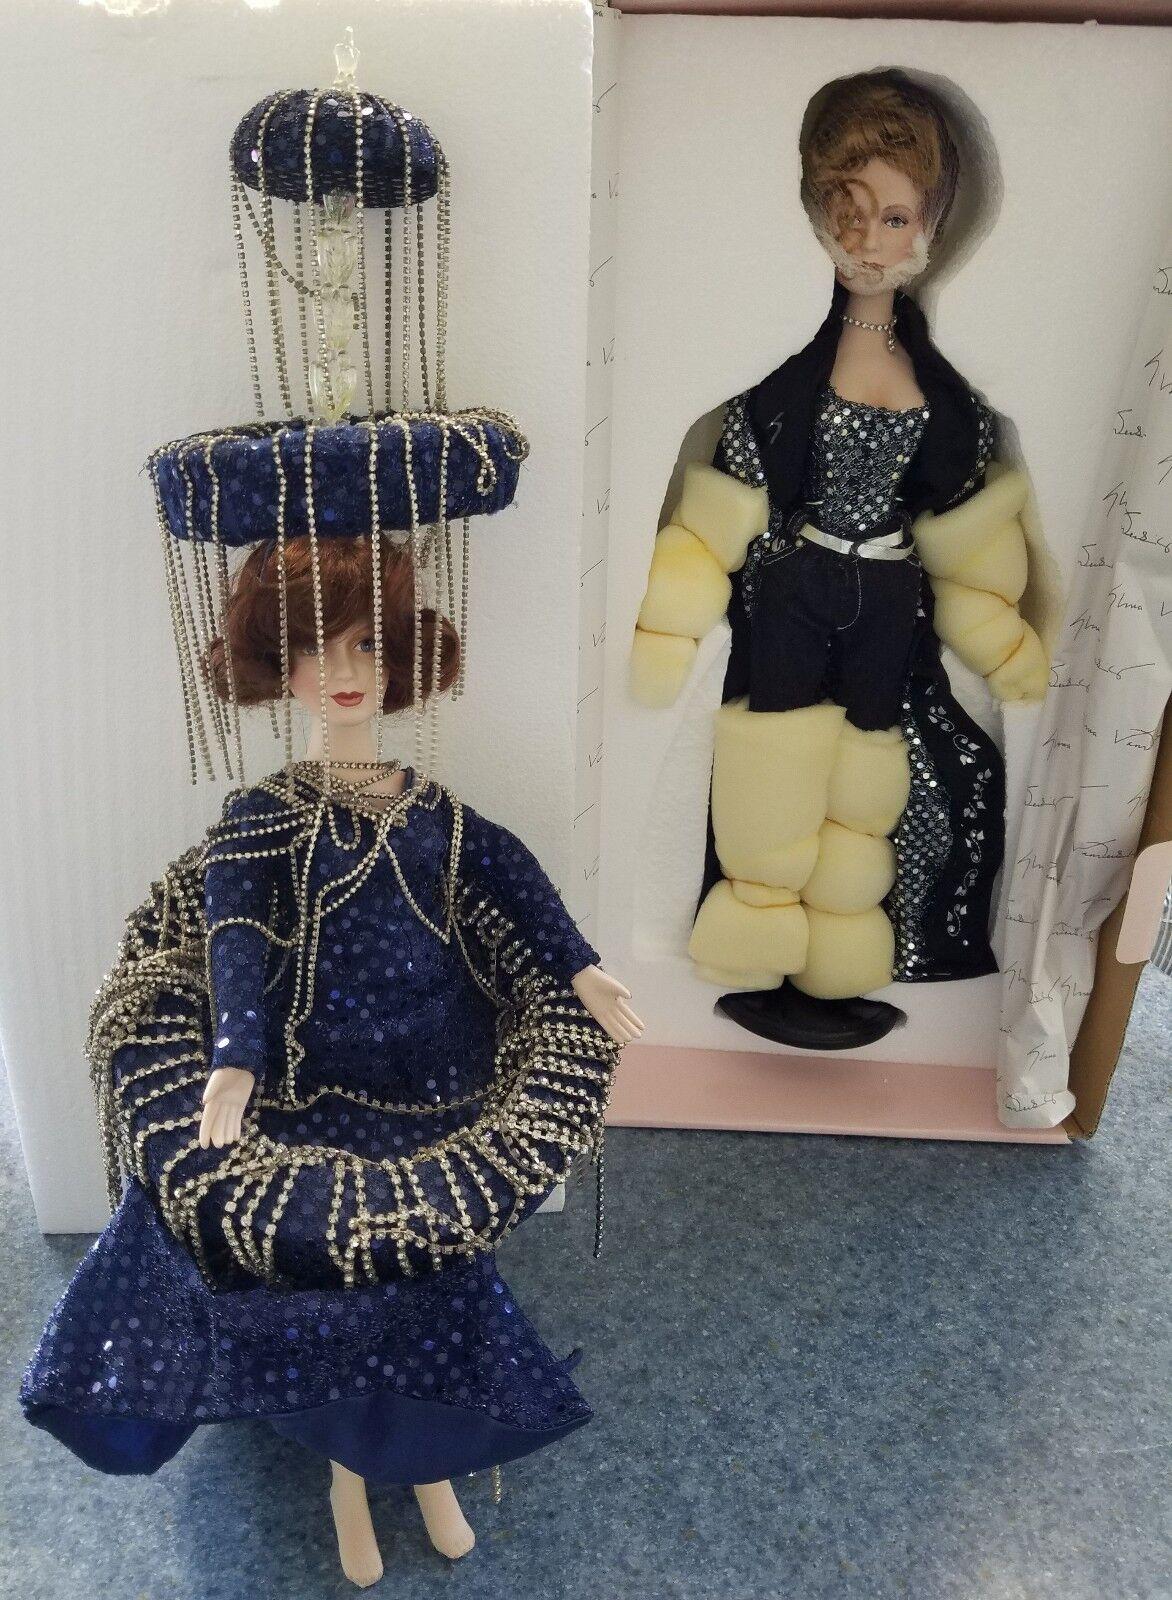 Collection of 2 Gloria Vanderbilt Porcelain Dolls